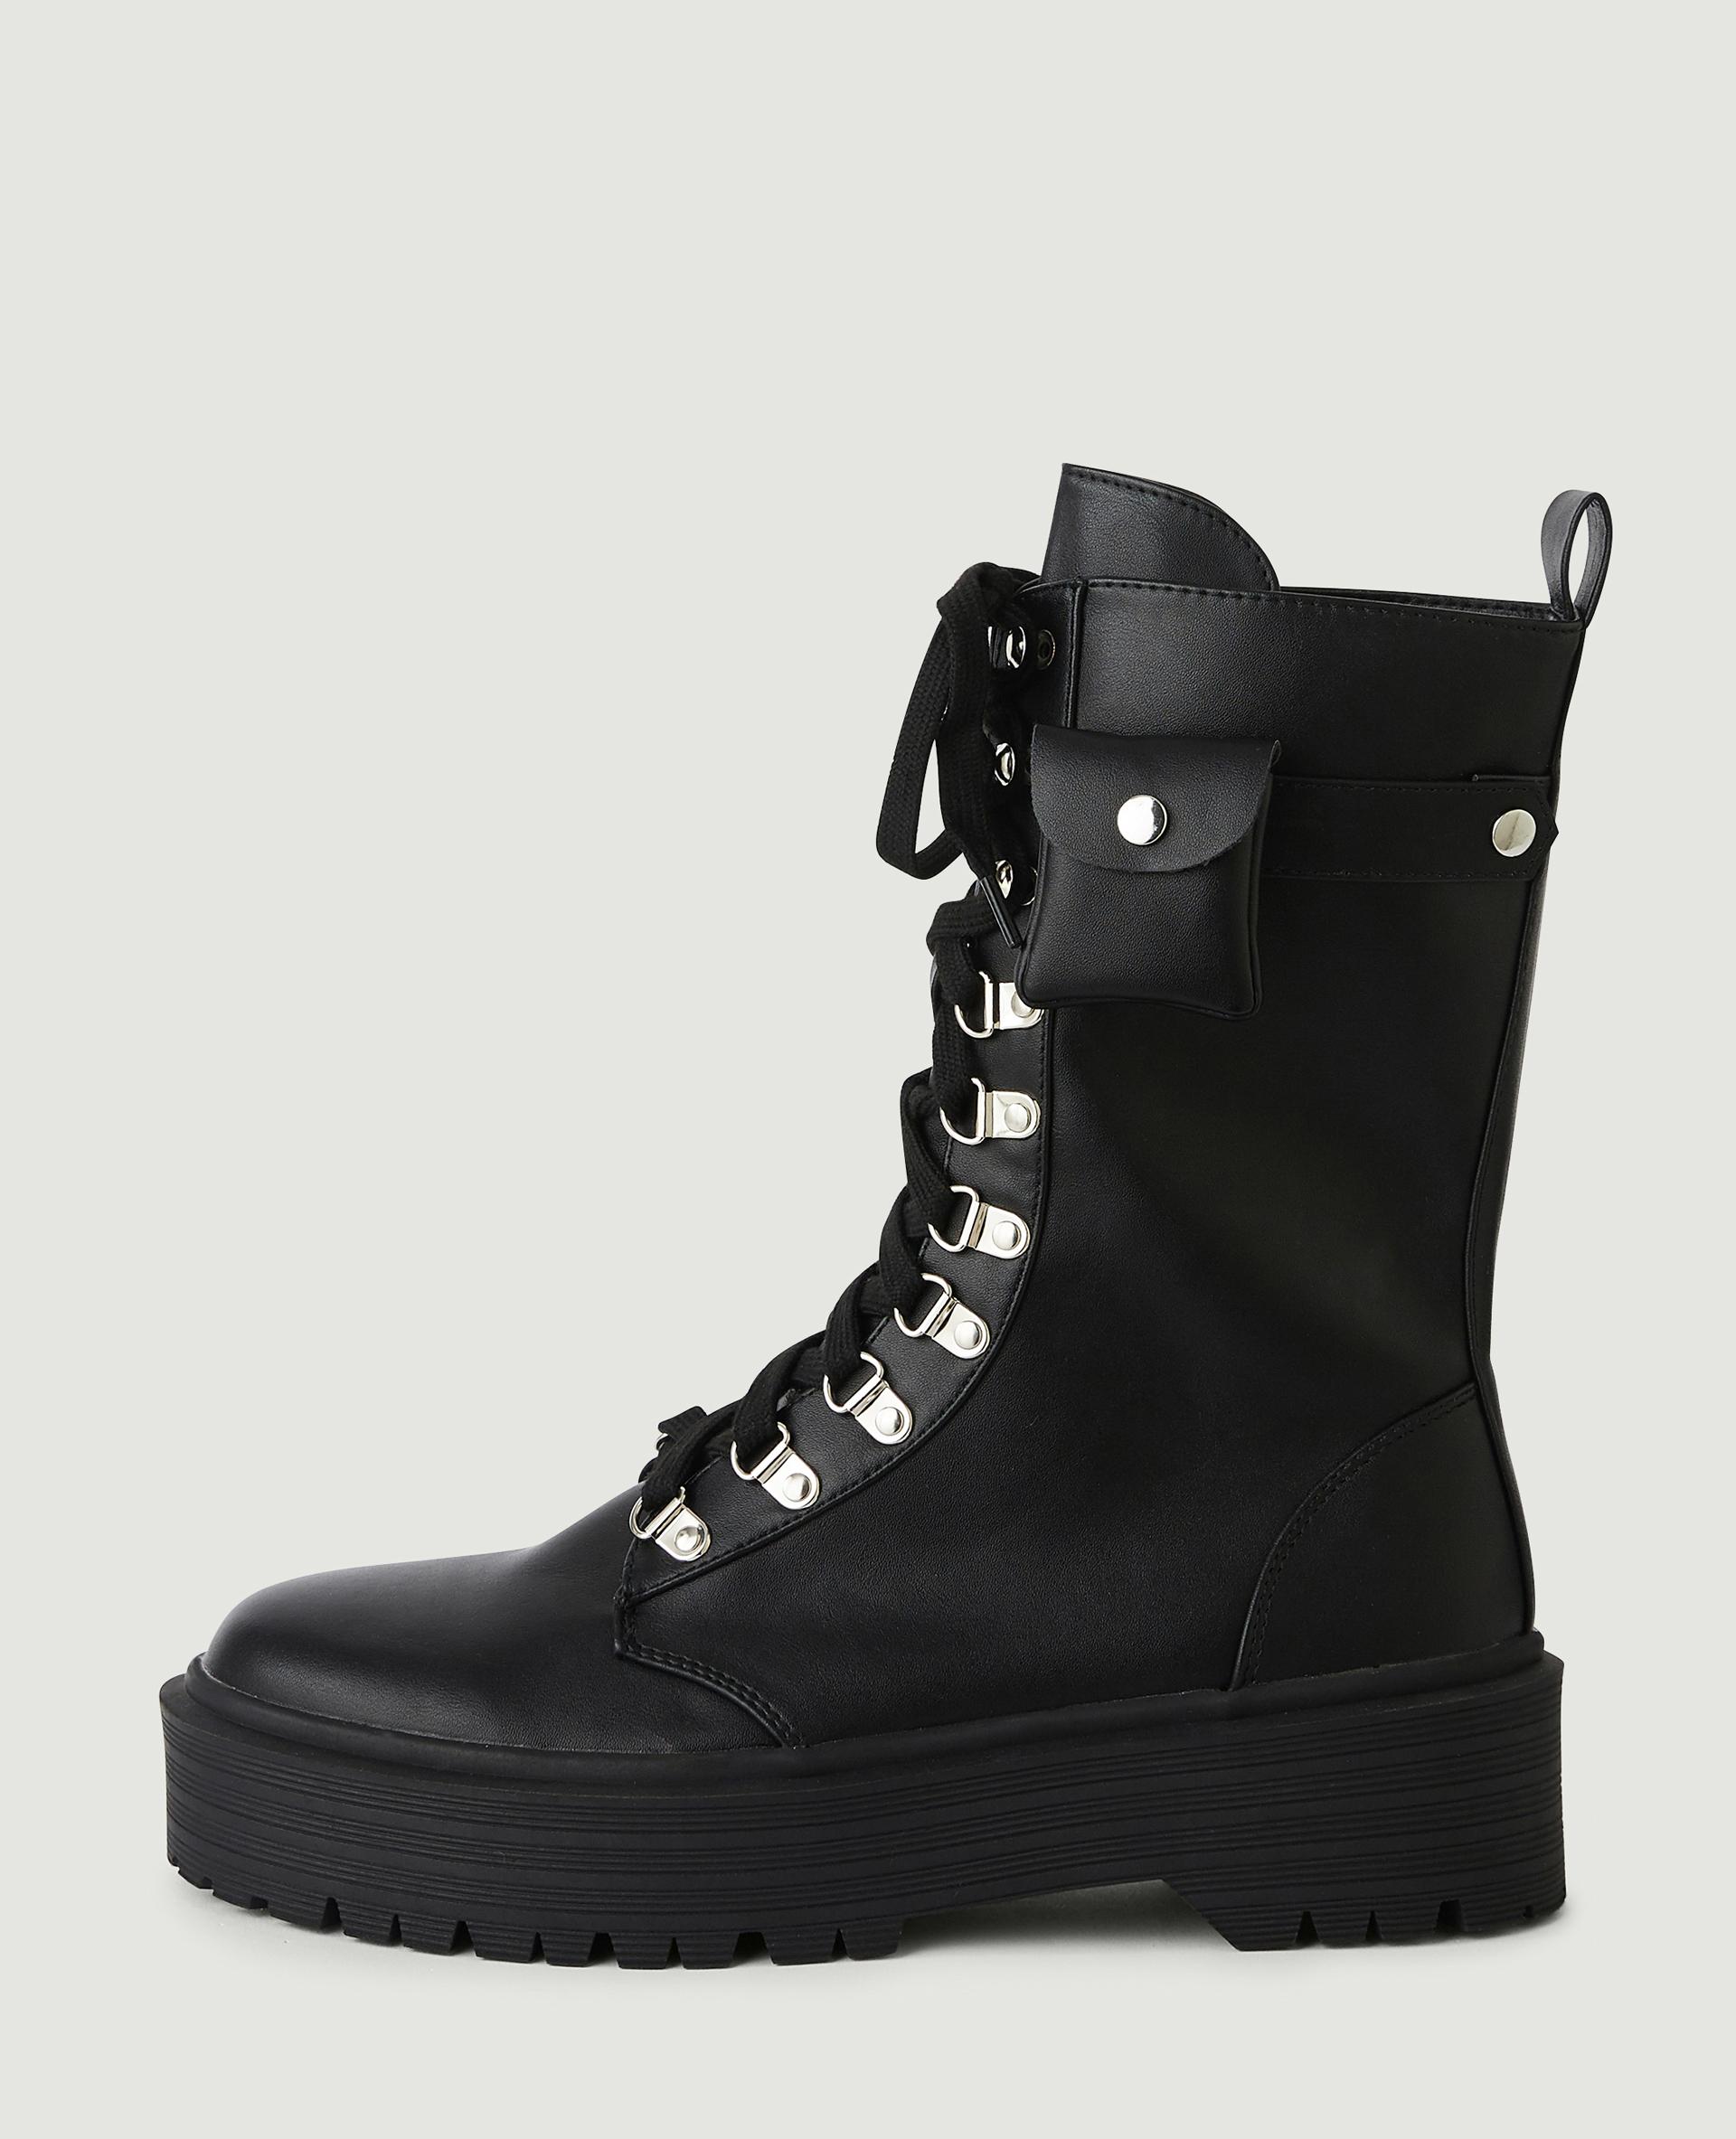 Bottines simili cuir style rangers noir - Pimkie